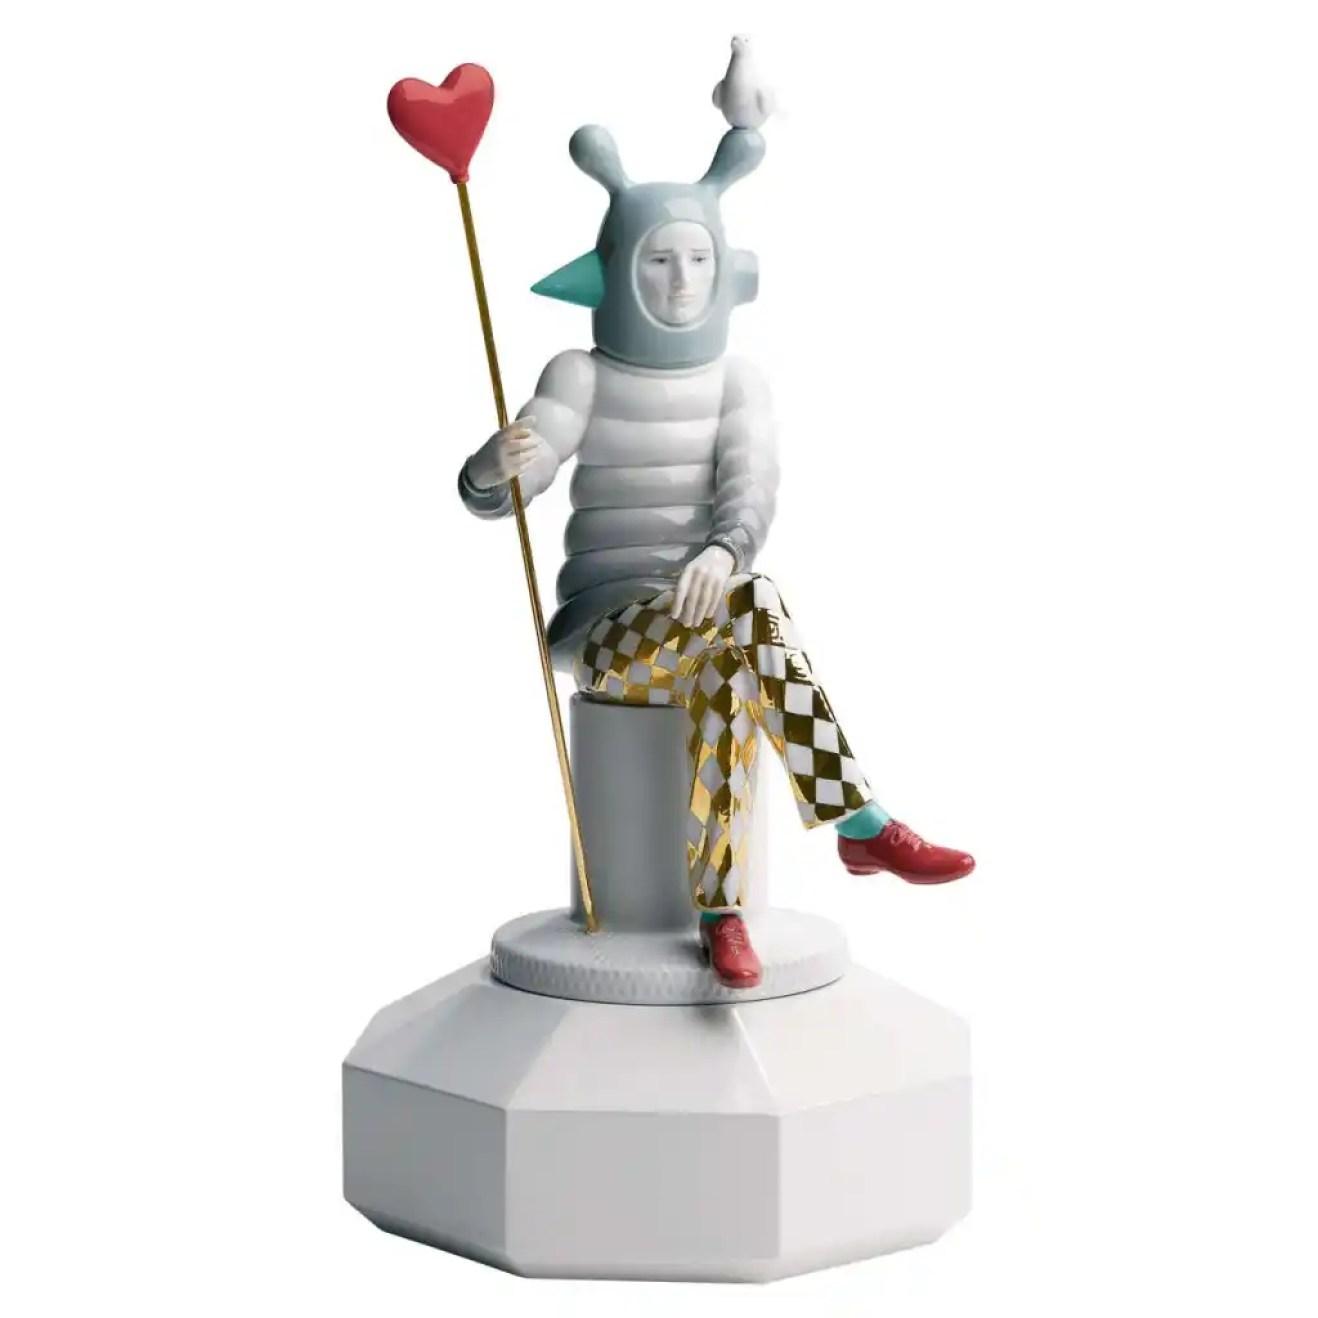 Lladro The Lover II Figurine by Jaime Hayon